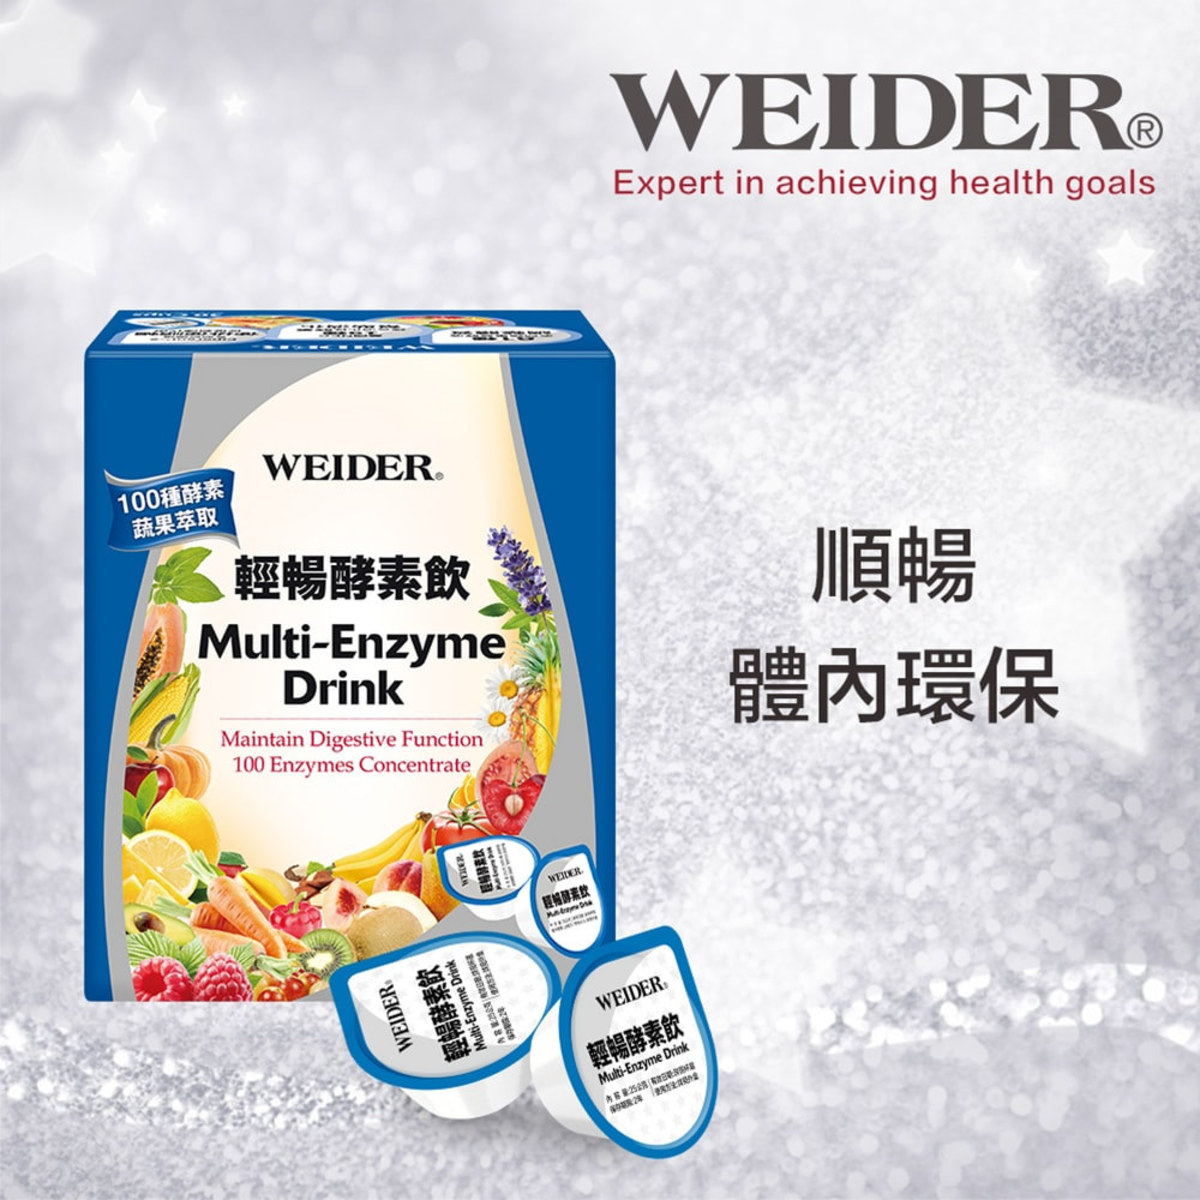 WEIDER 威德輕暢酵素飲 60個 (30個 X 2盒)